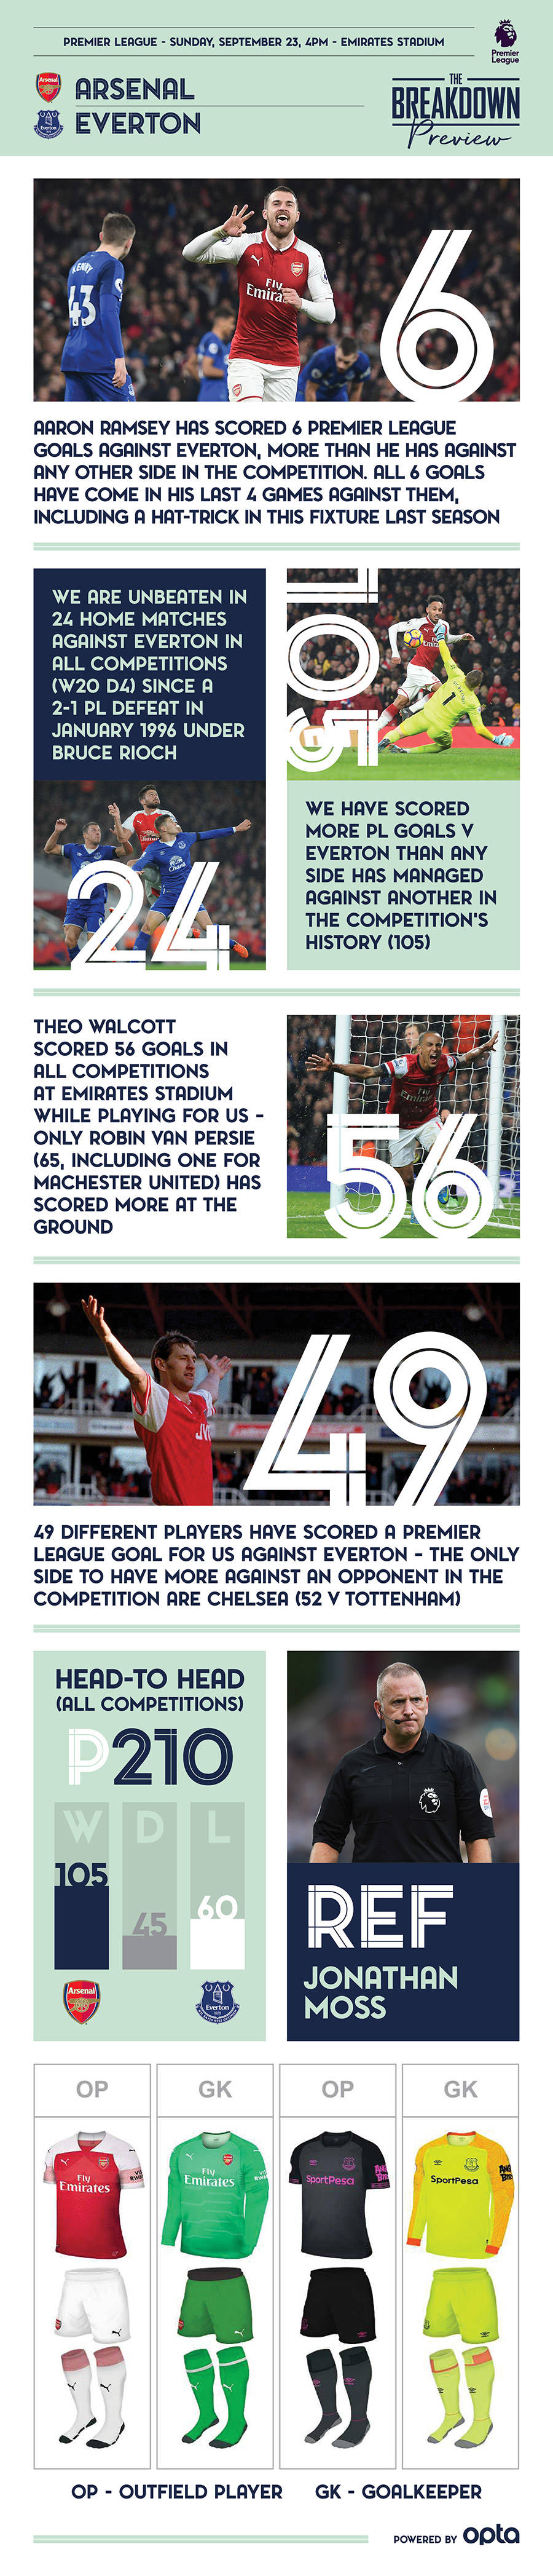 The Breakdown - Everton